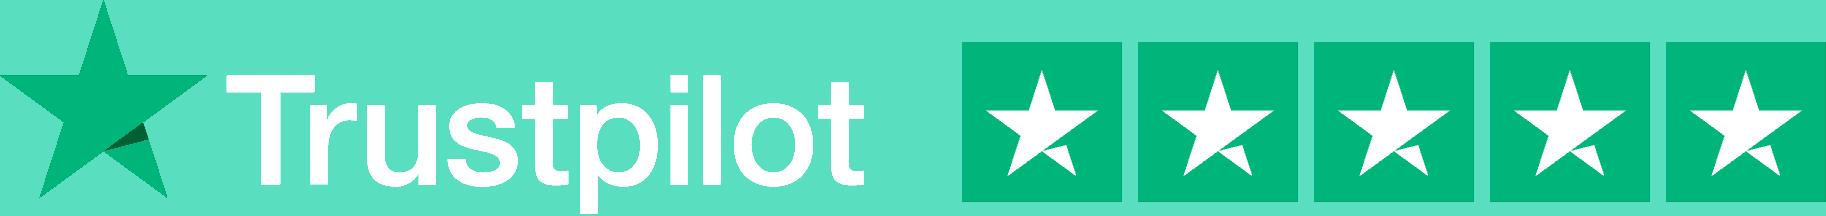 Trustpilot Logo White